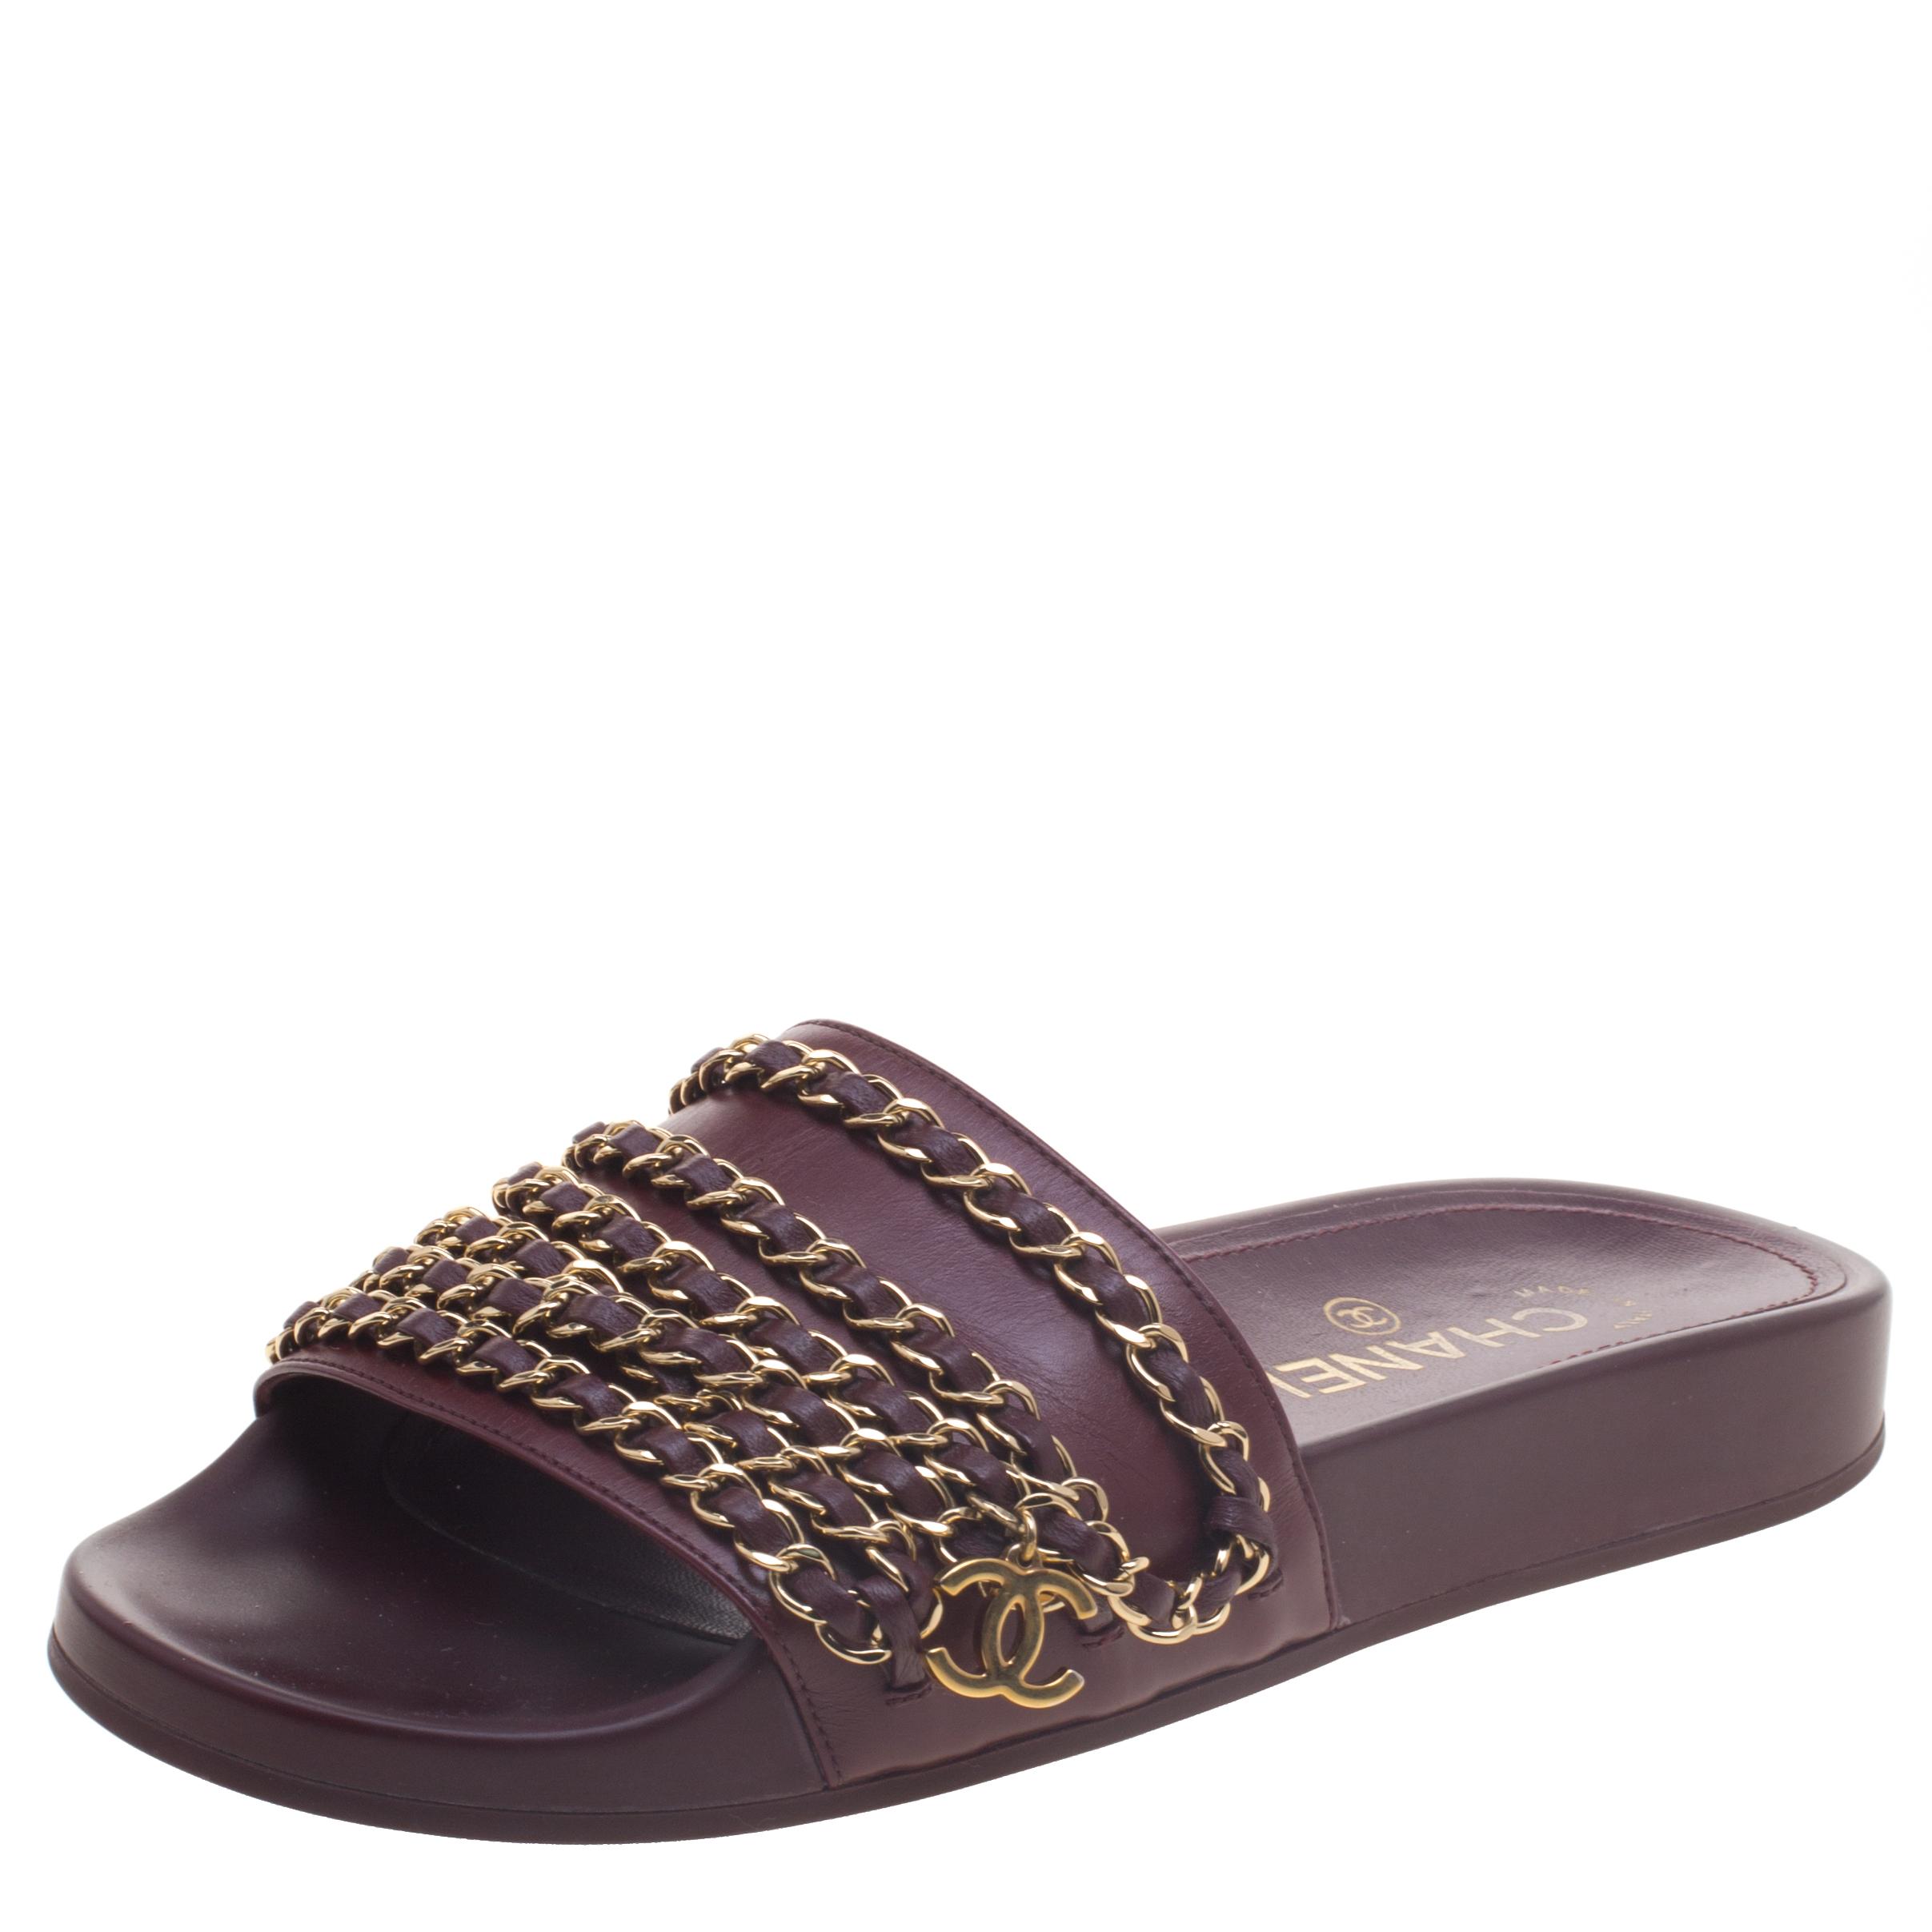 061bd55f0366 ... Chanel Burgundy Leather Tropiconic Chain Detail Slides Size 37.  nextprev. prevnext